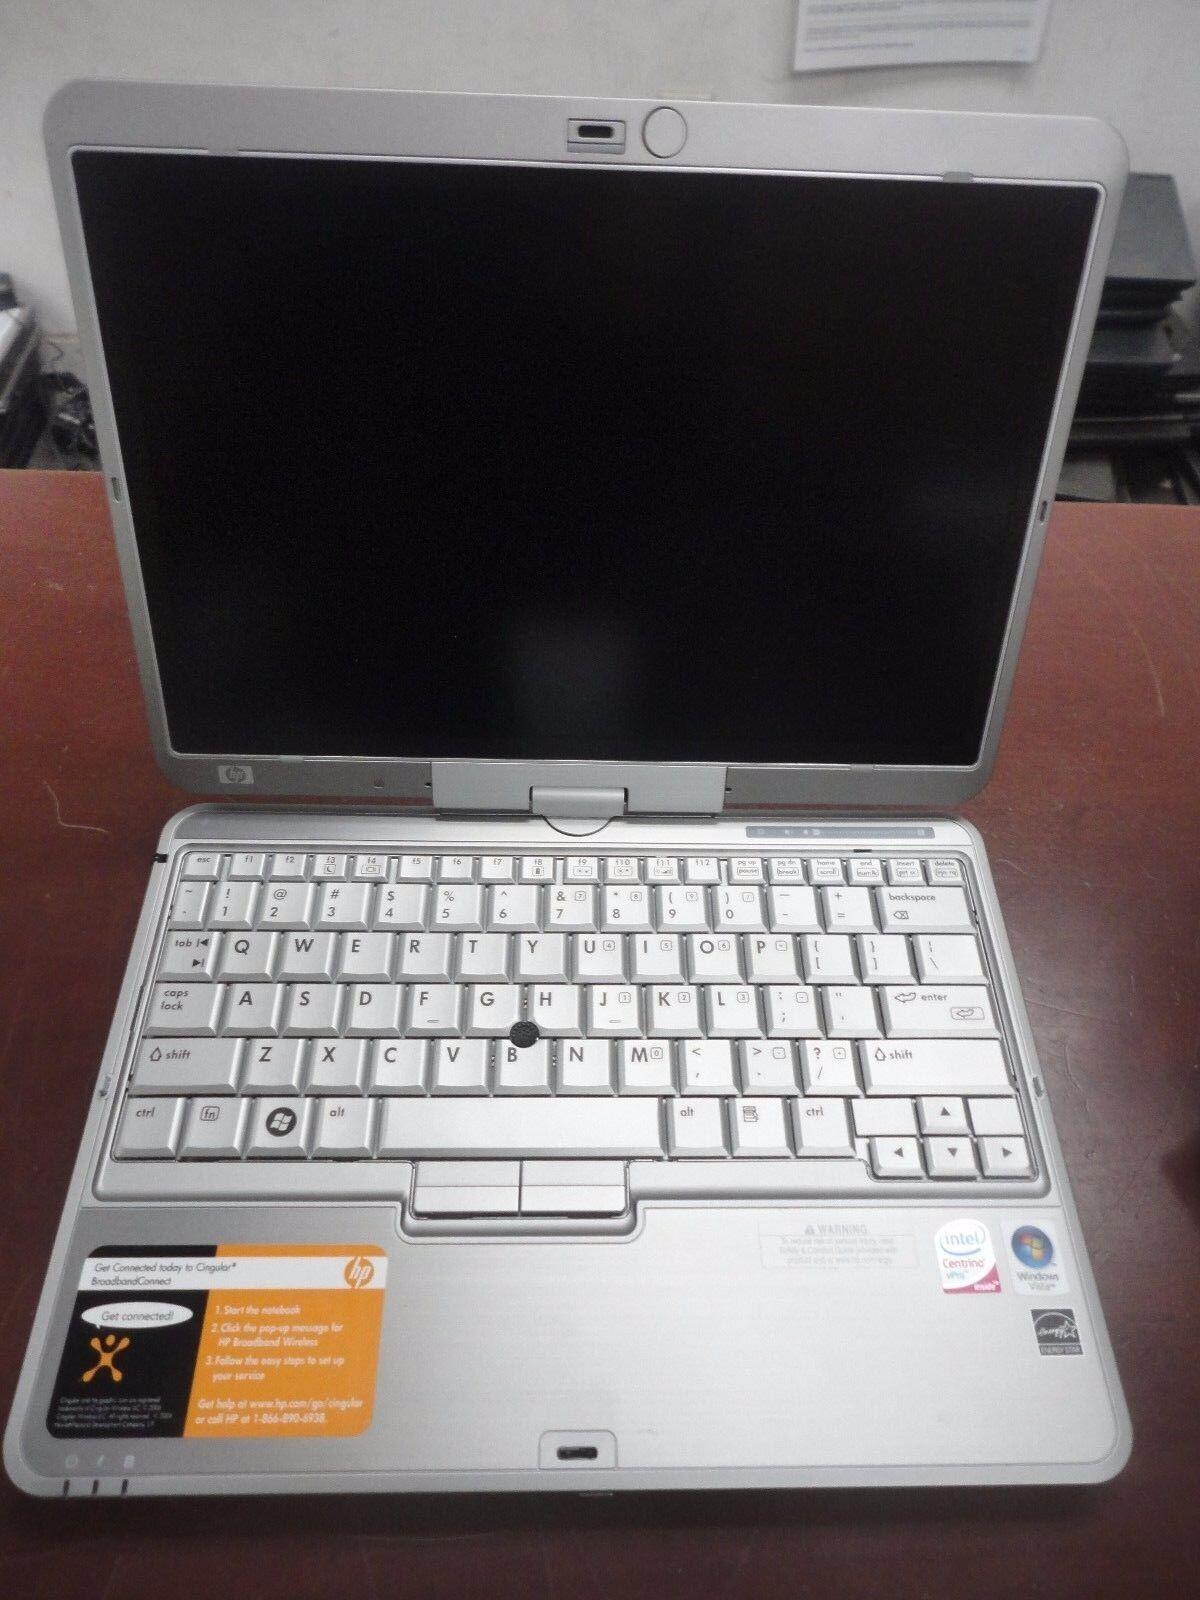 LOT 5 HP Compaq 2710p Core 2 Duo 1.20GHz 2GB WiFi Touchscreen Tablet Stylus Pen